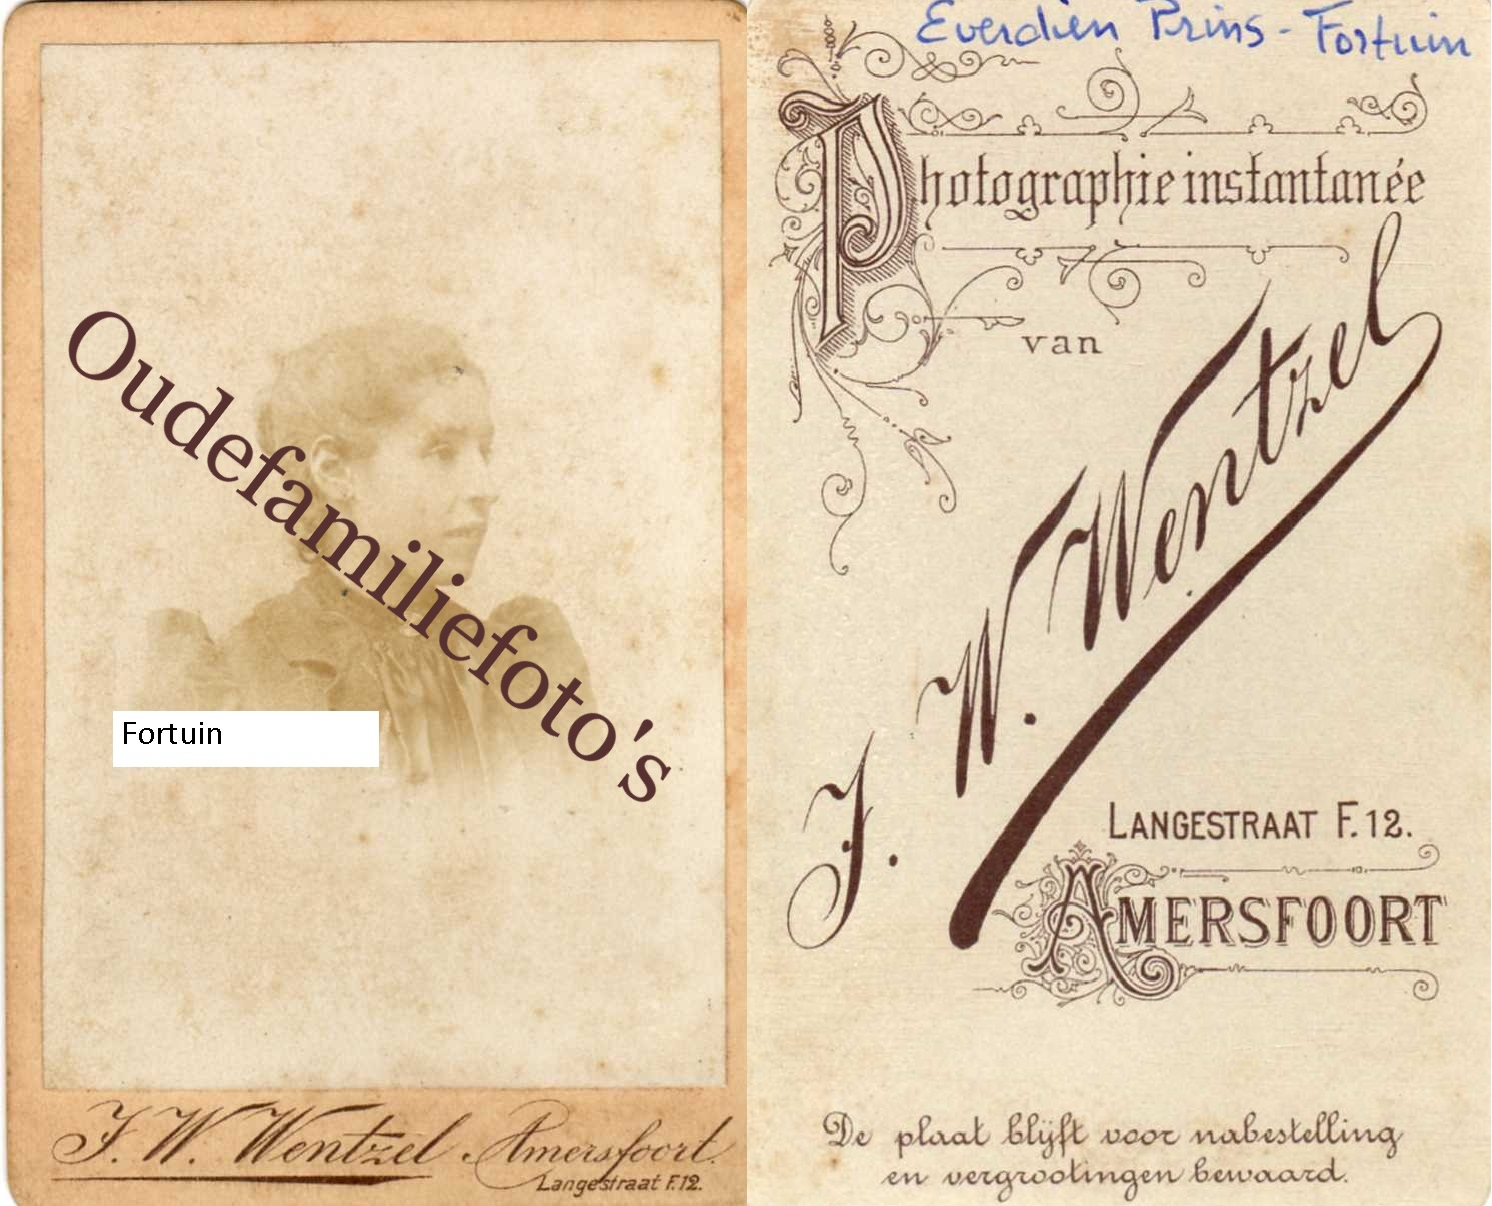 Fortuin, Everdina Eliza. Geb. 12-11-1873 Amersfoort. Getrouwd met C.J.F. Prins € 2,00